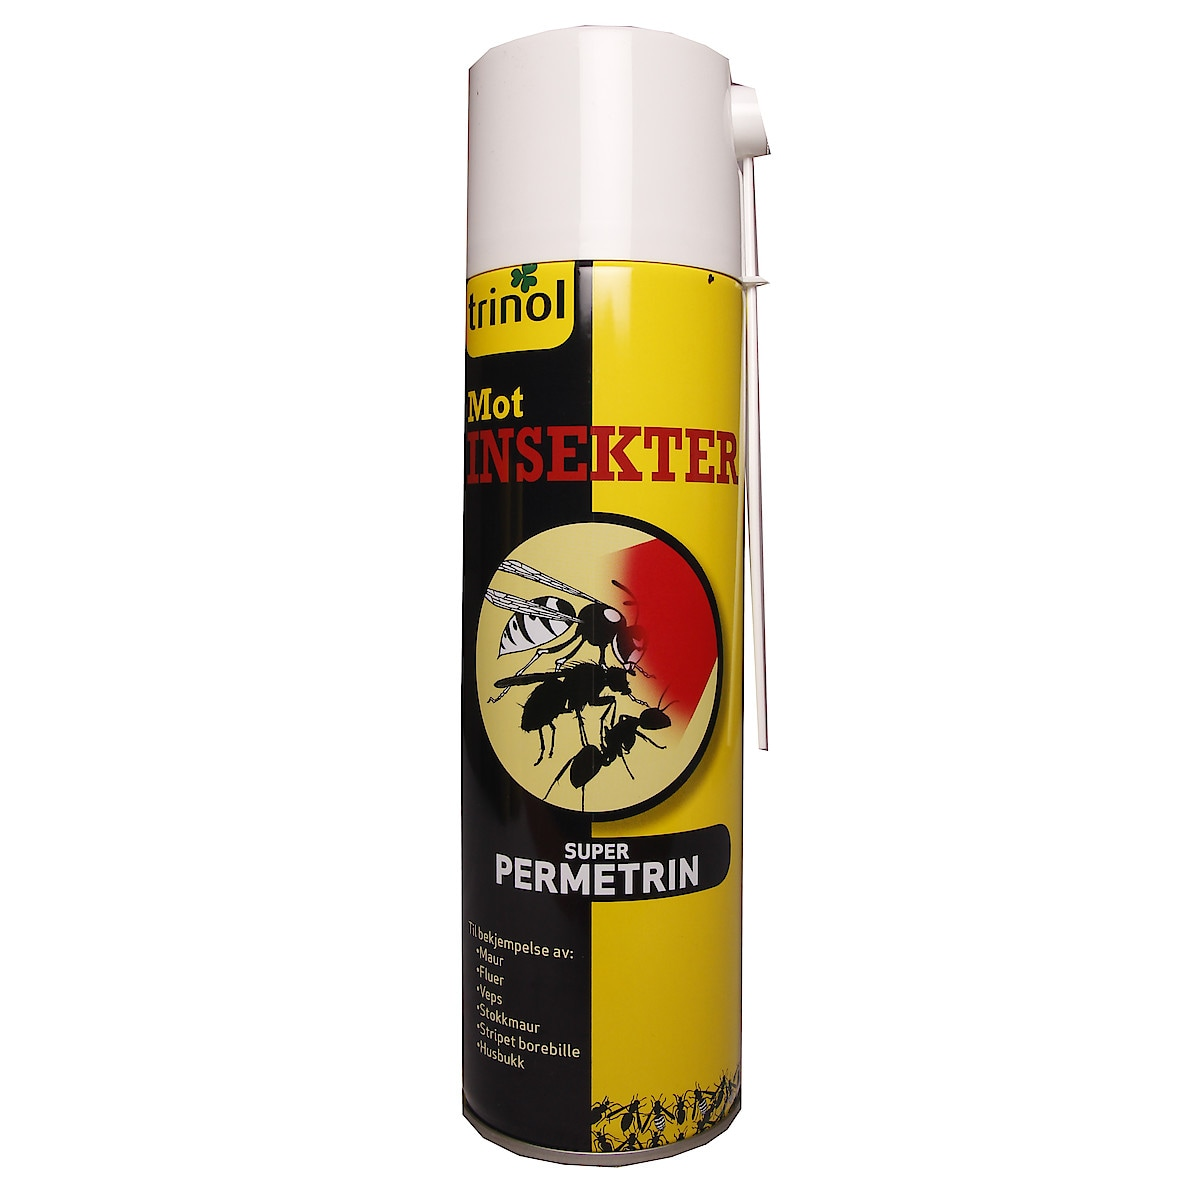 Trinol Super Permetrin insektsspray, 500 ml